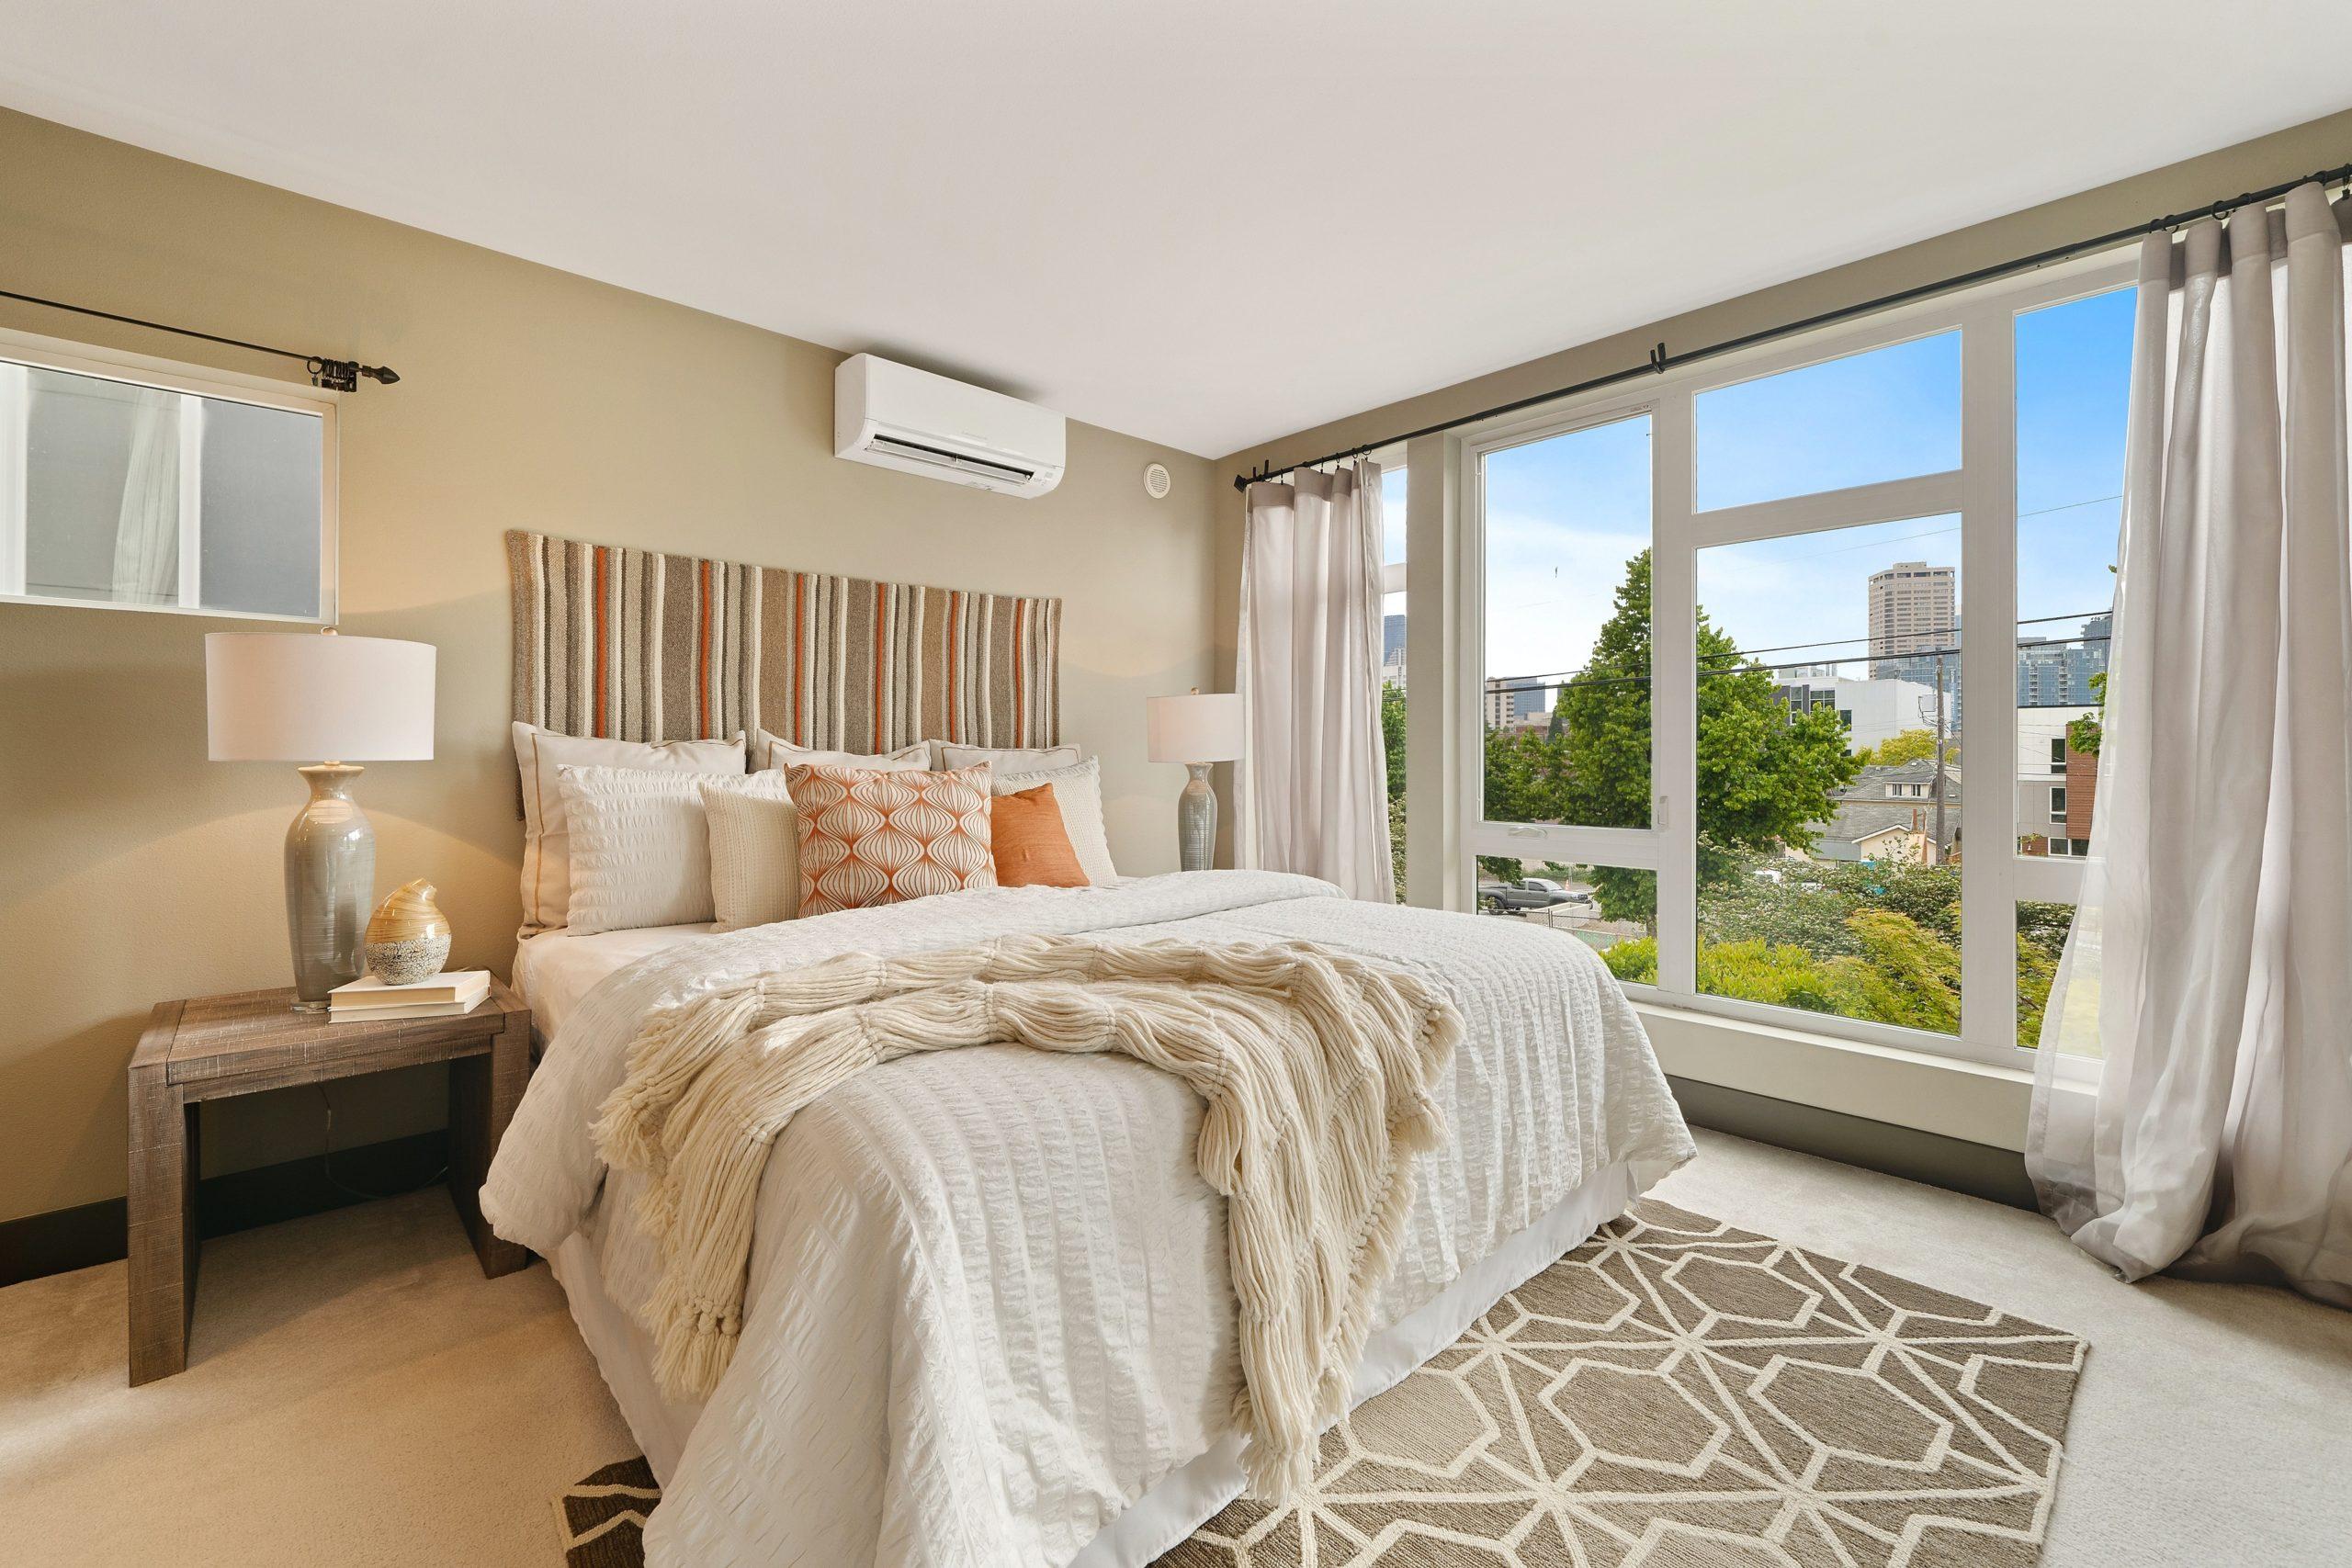 images of bedroom furniture